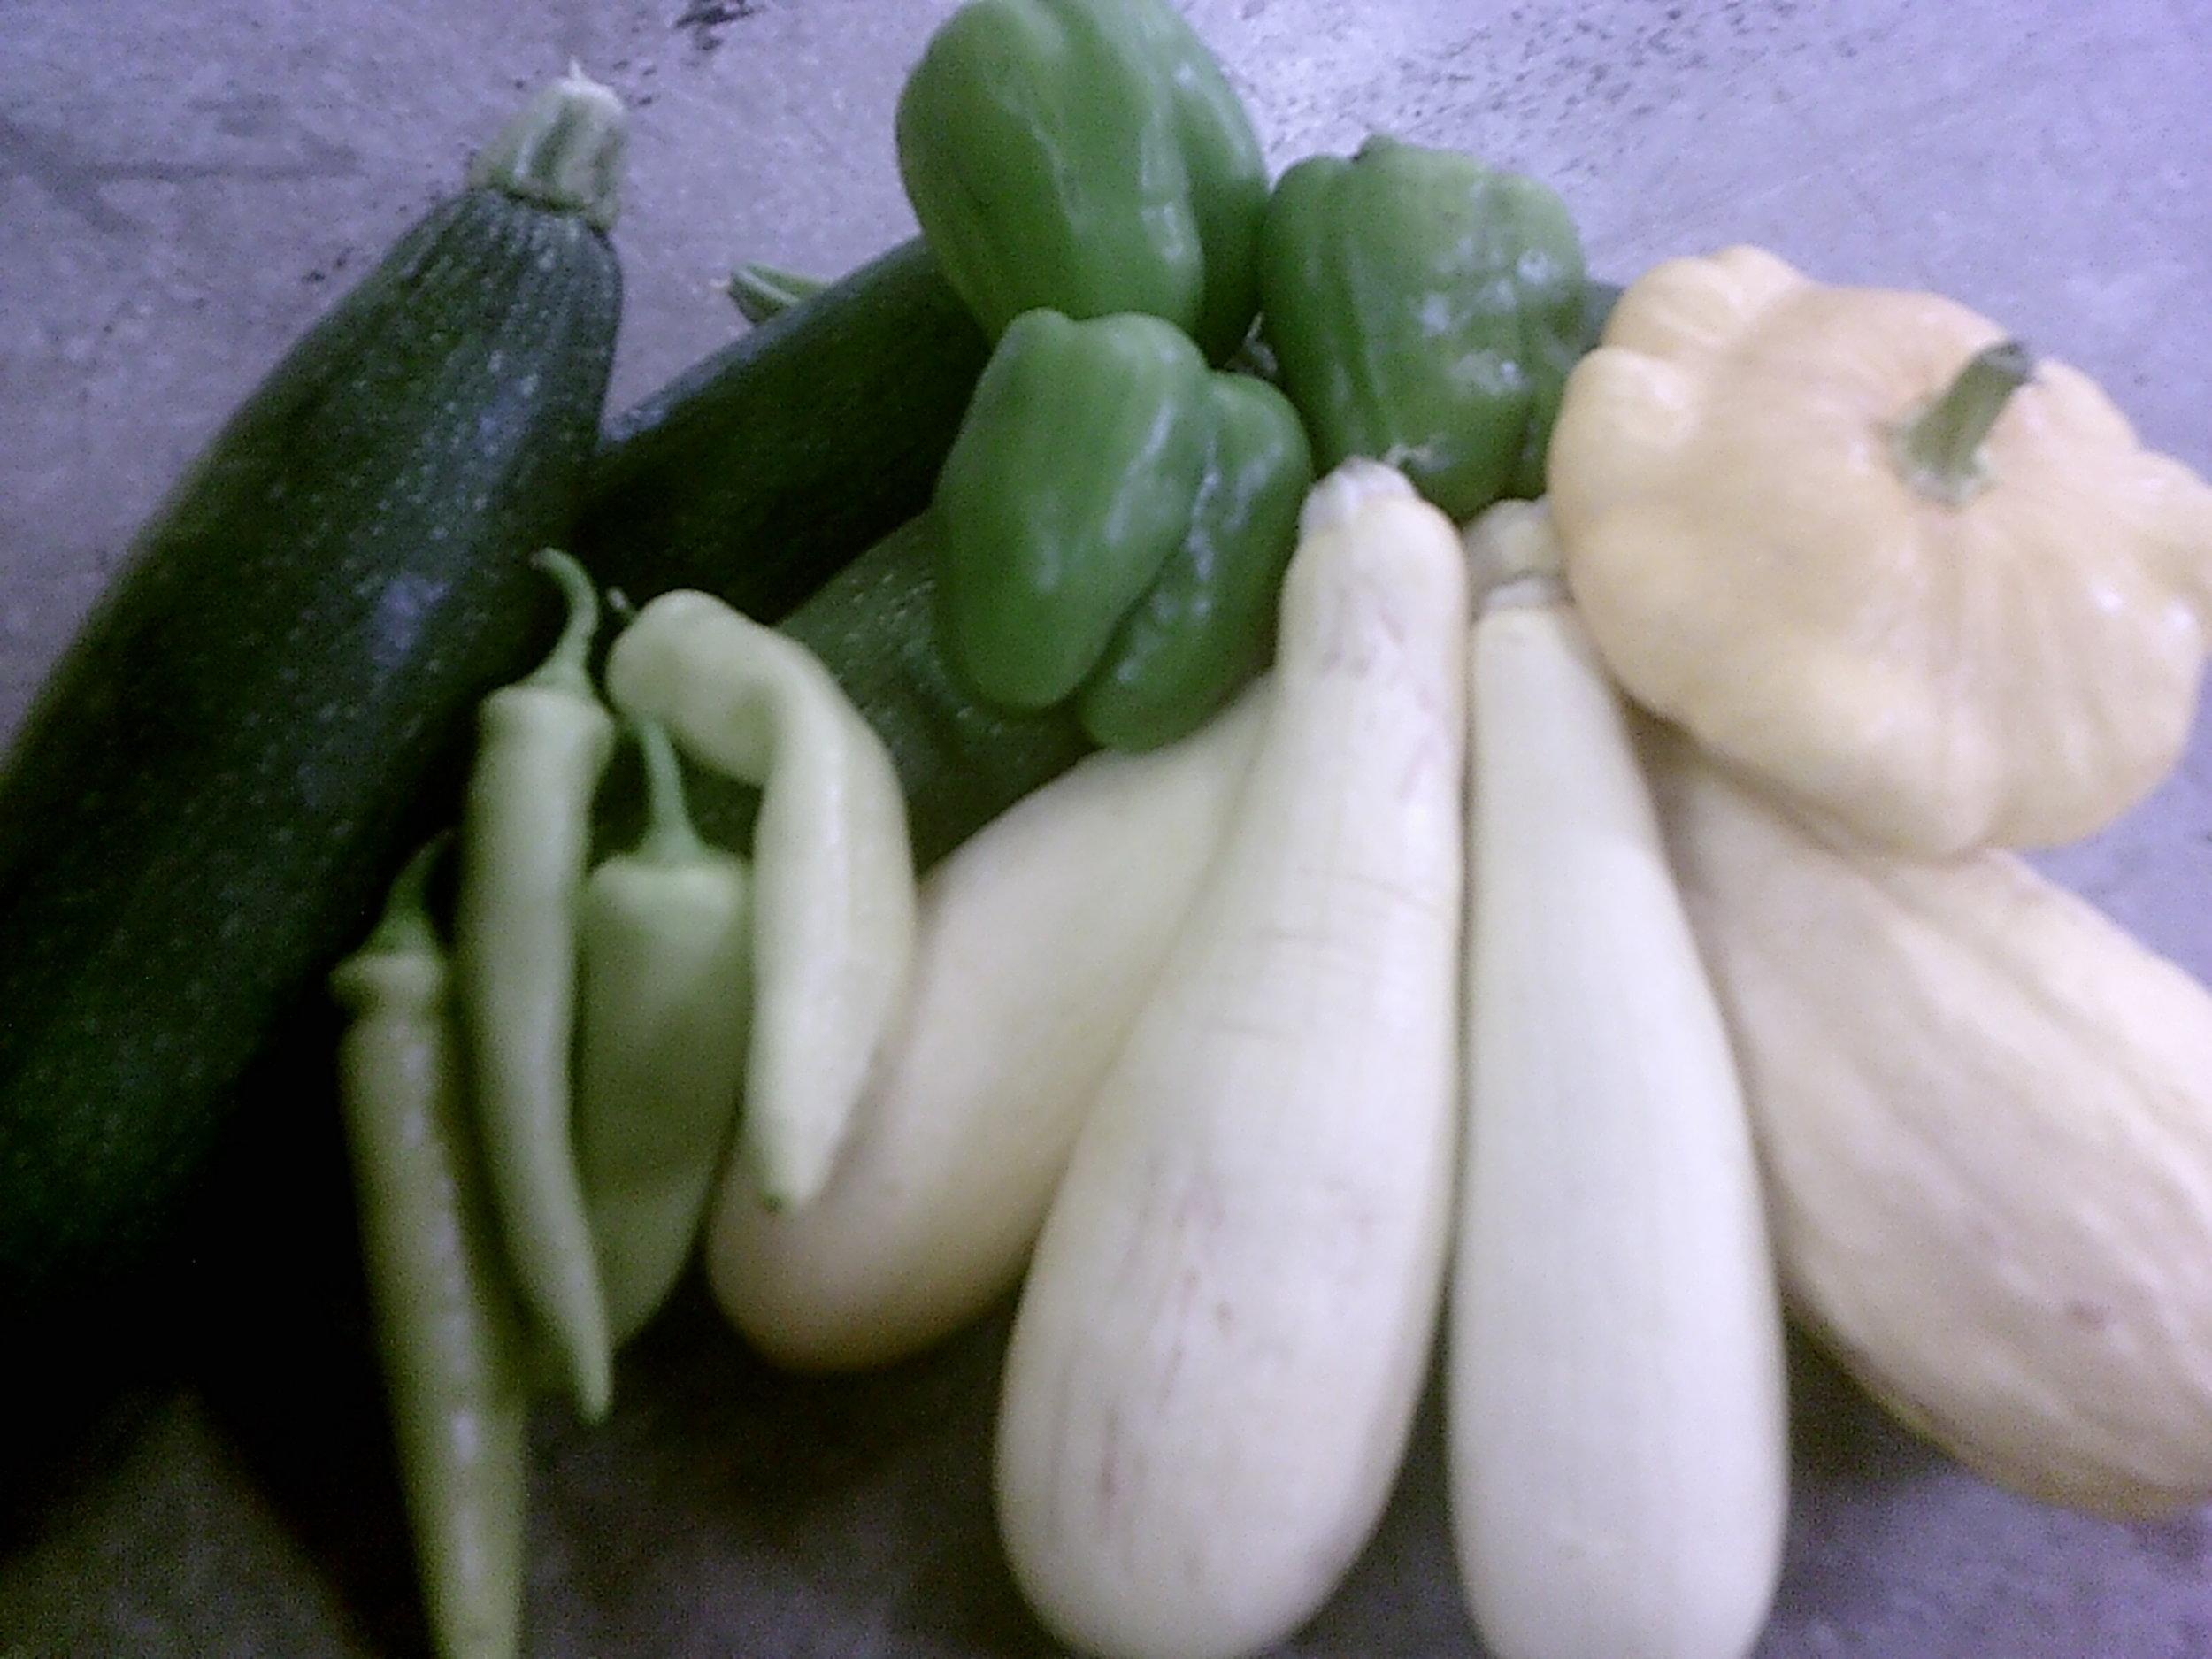 squash,zucc,peppers,.JPG